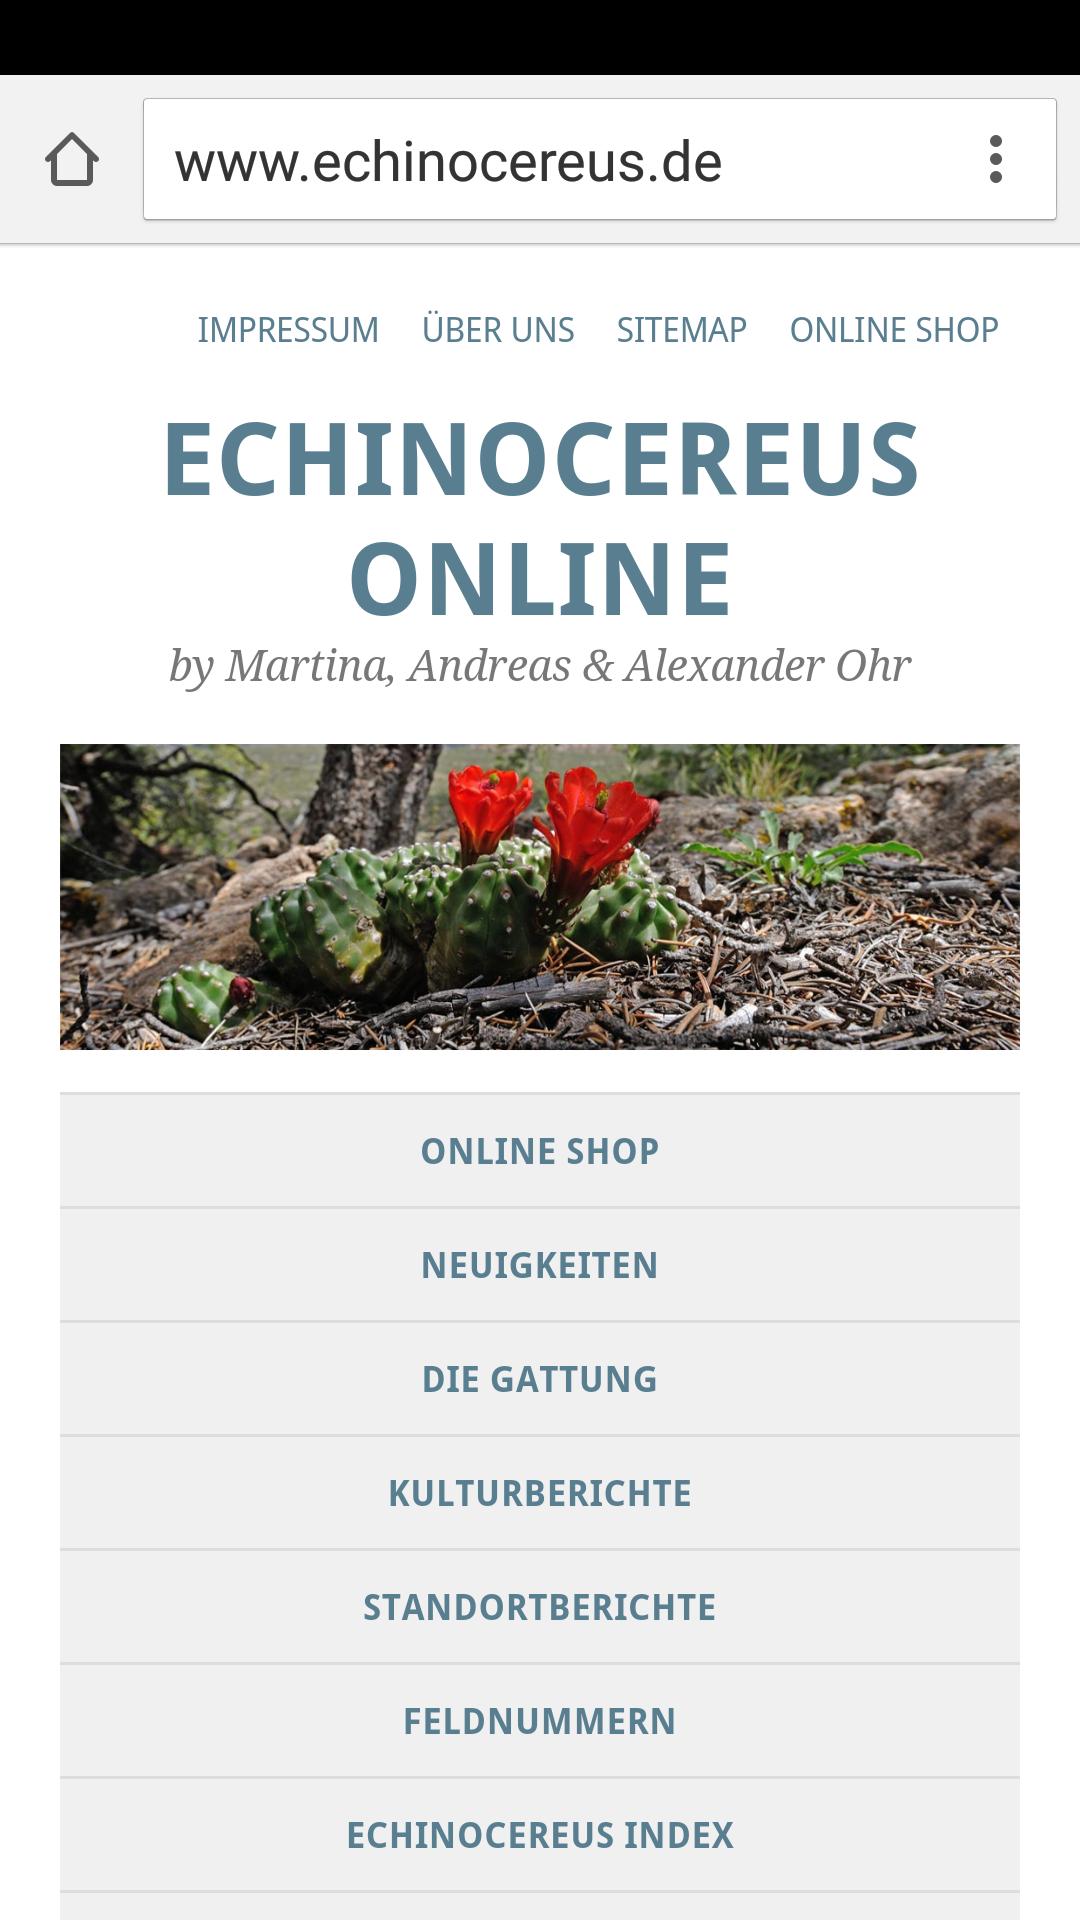 echinocereus_mobile